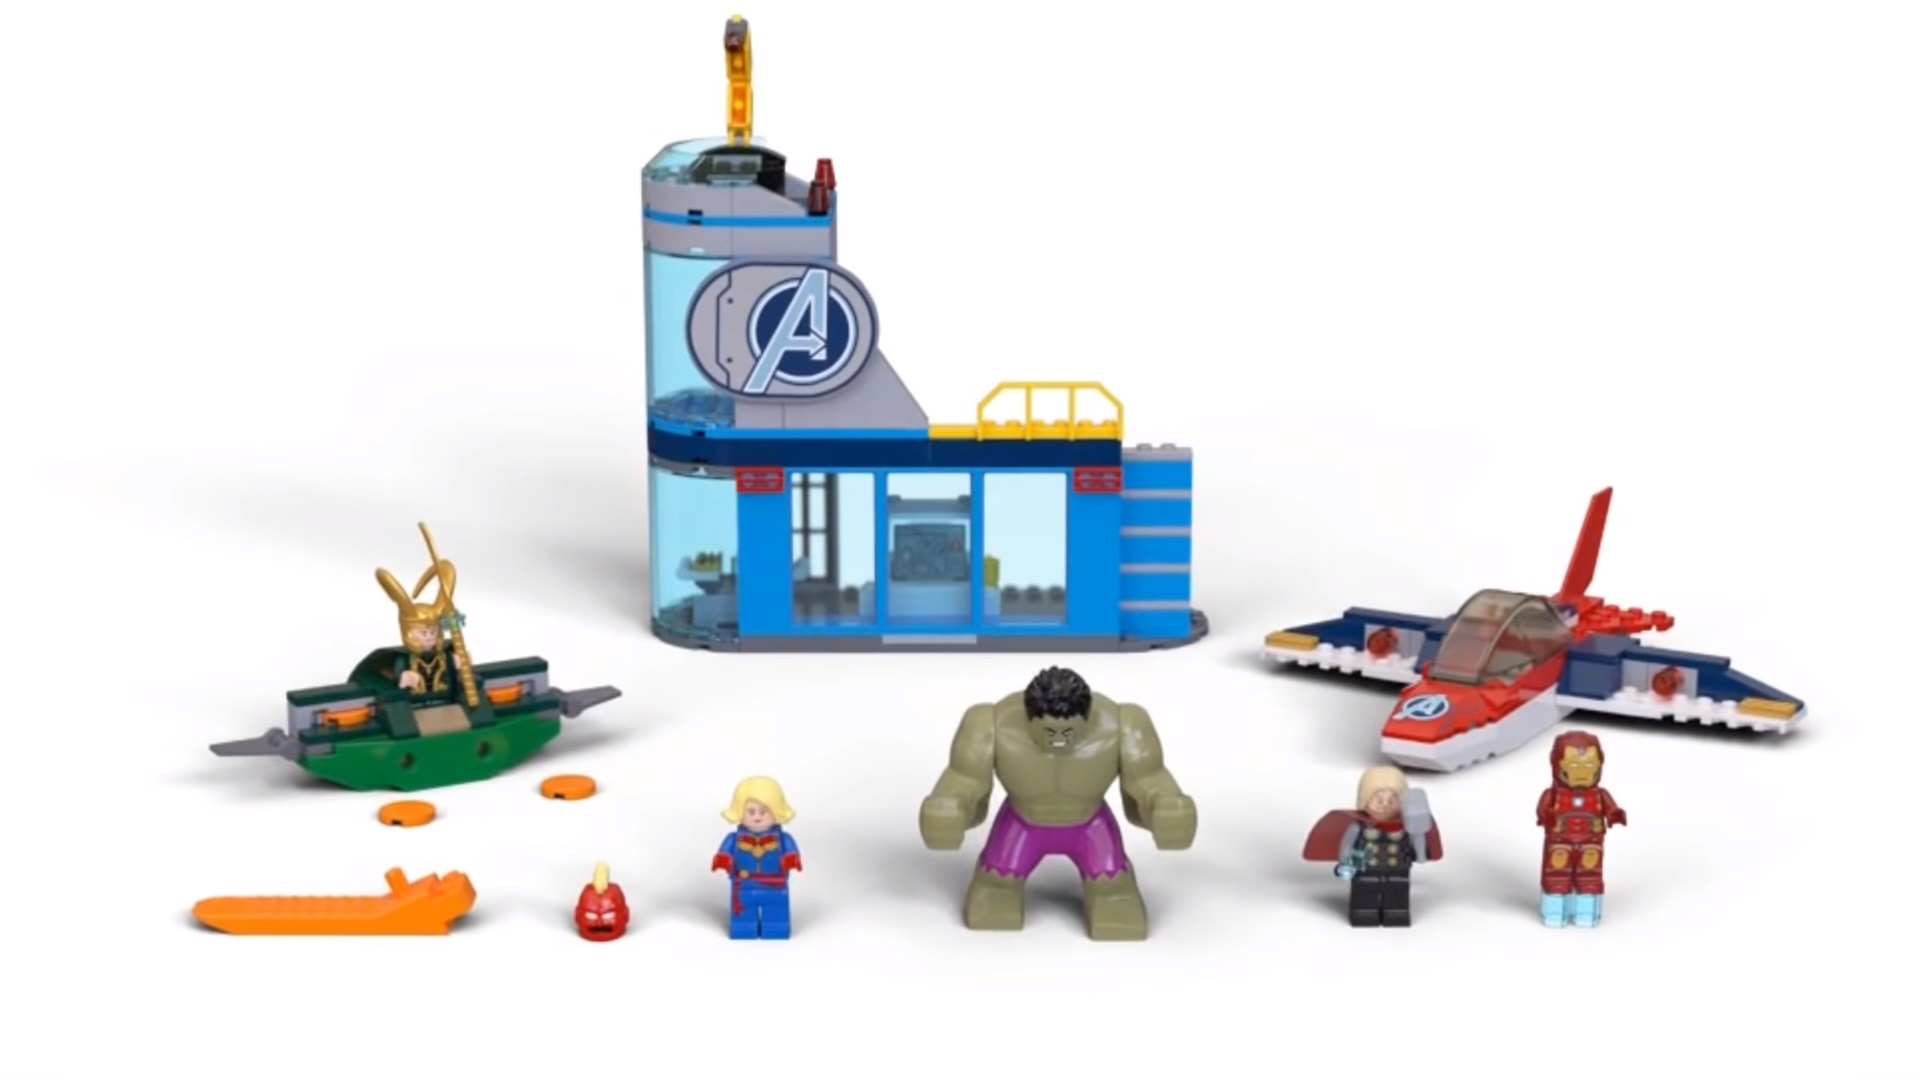 LEGO Marvel Super Heroes Summer 2020 Wrath of Loki 76152 1920x1080